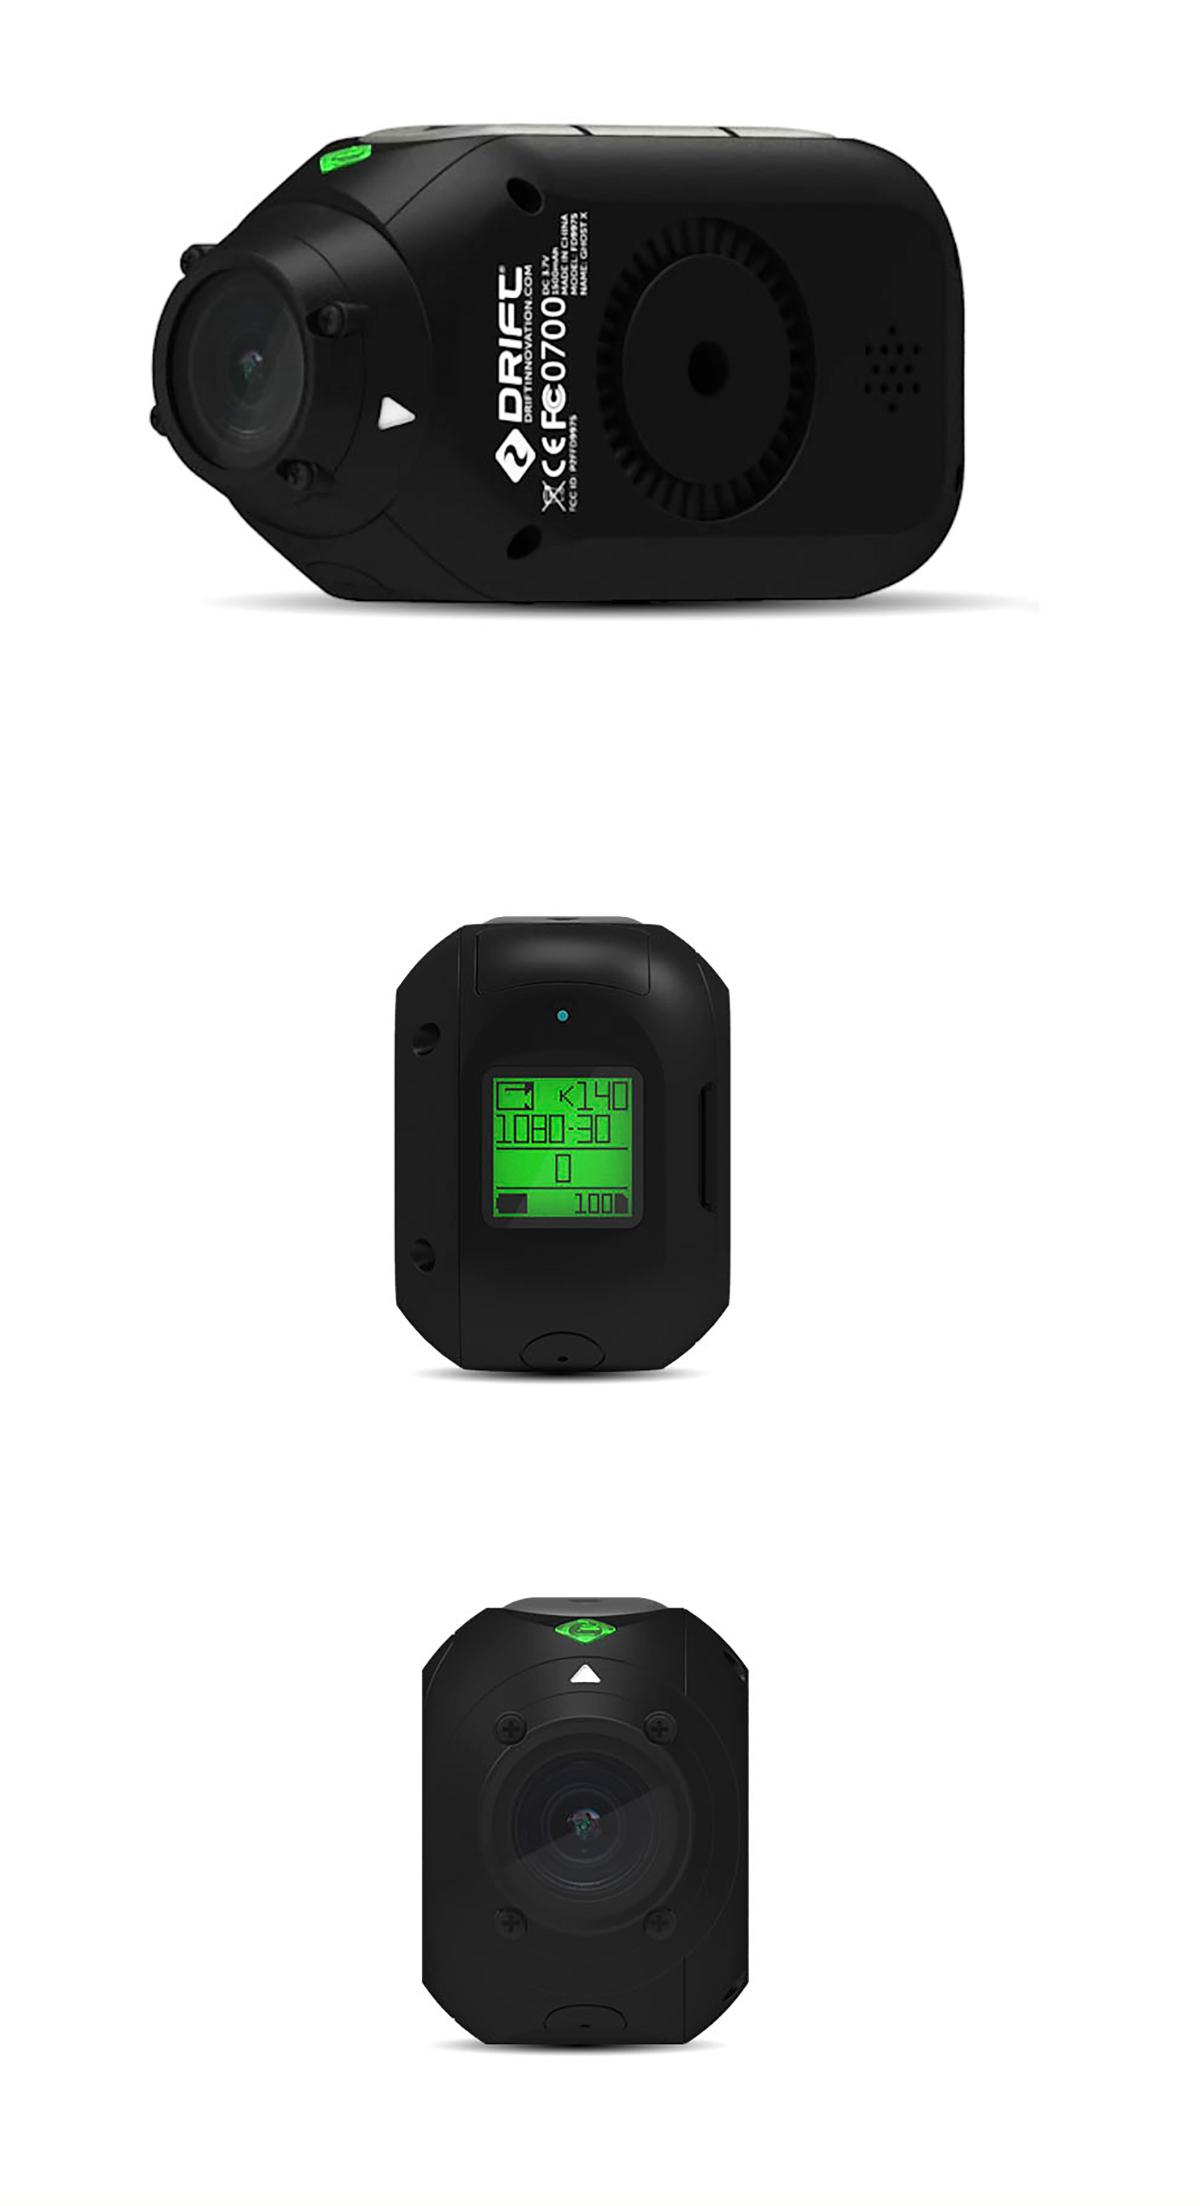 Cámara Cam fantasma X Plus MC 1080P 17